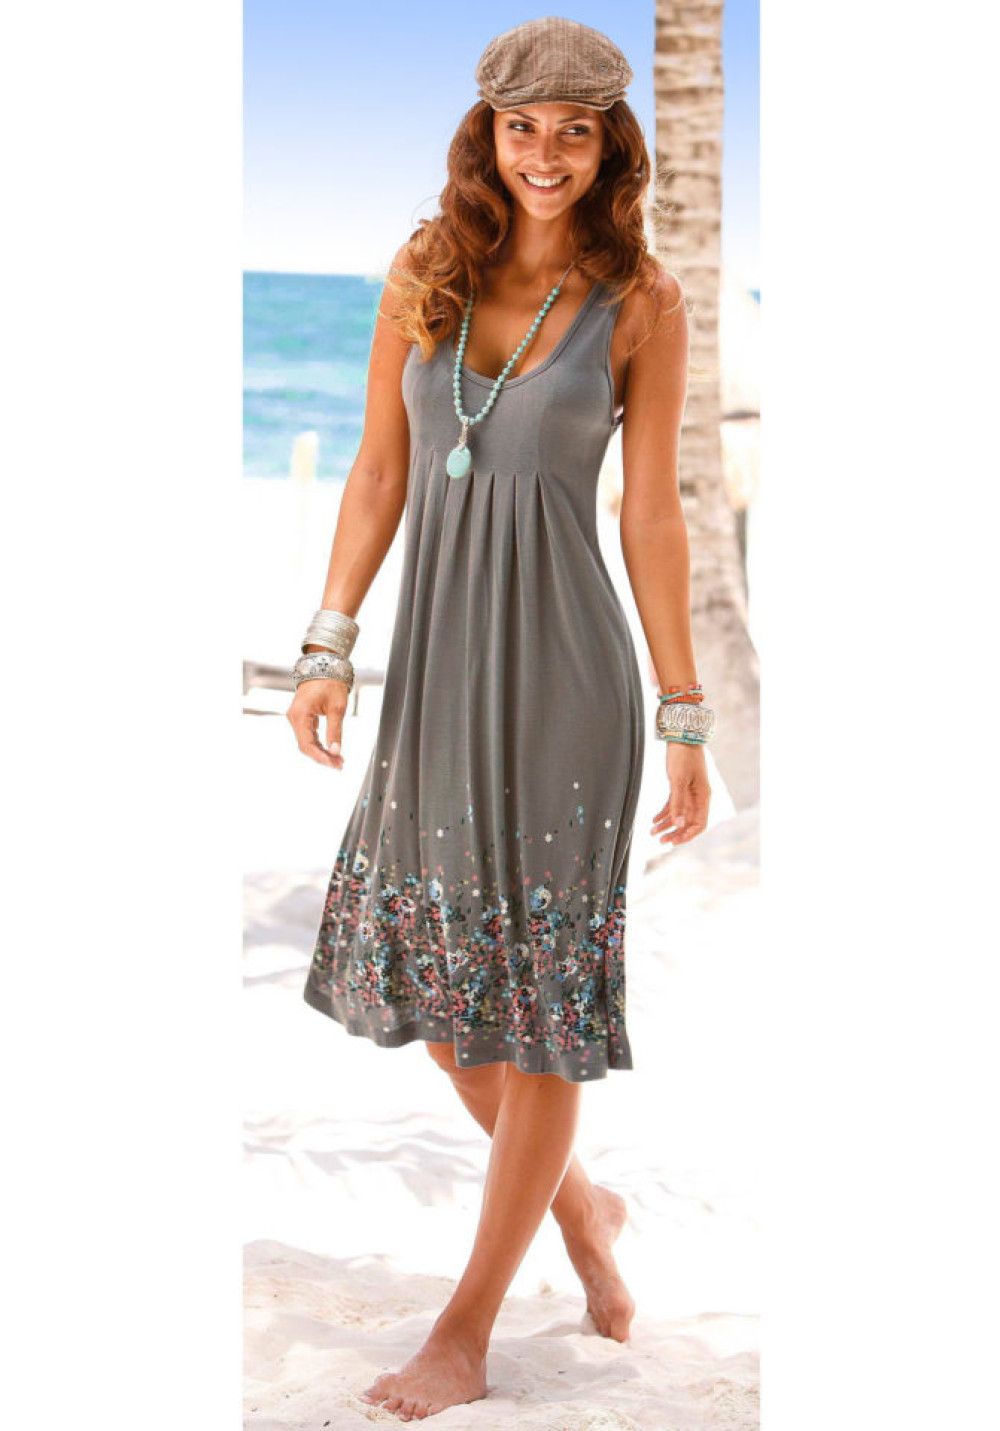 Beachtime Plážové šaty Beachtime hnedosivá 34 - Glami.sk 2ee1c14deef